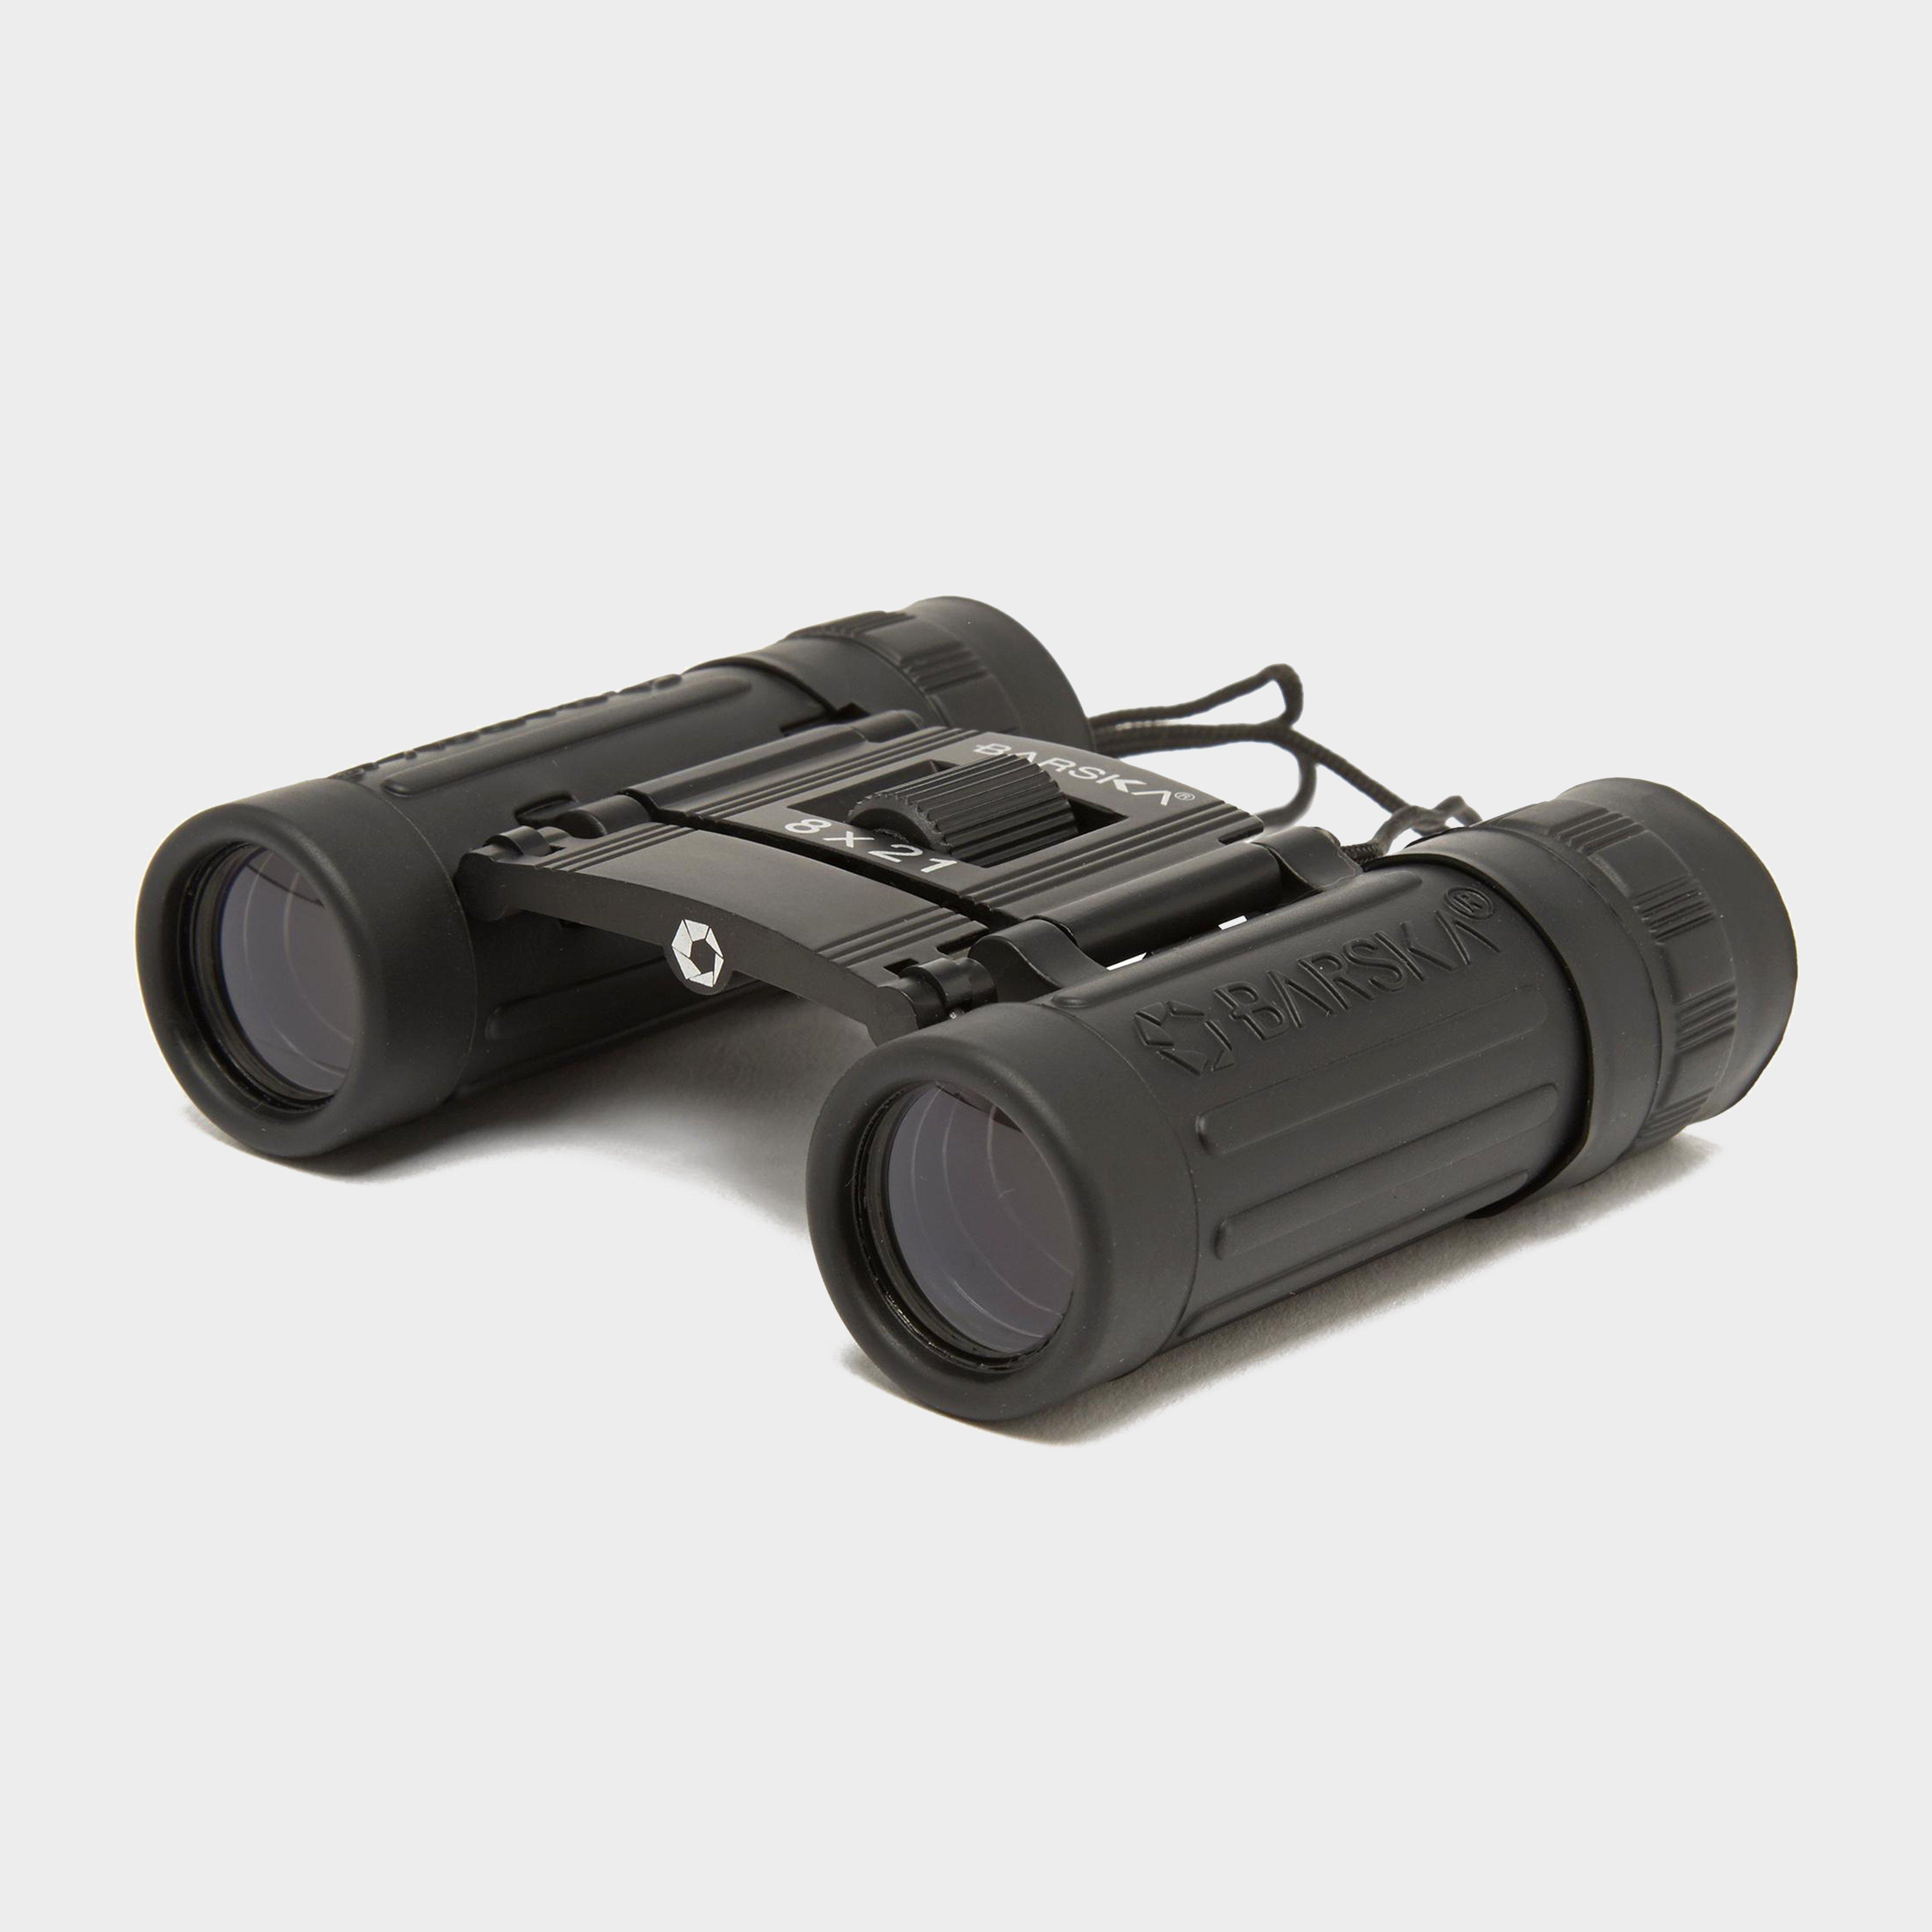 Barska Lucid View 8 X 21 Binoculars - Black/blk  Black/blk